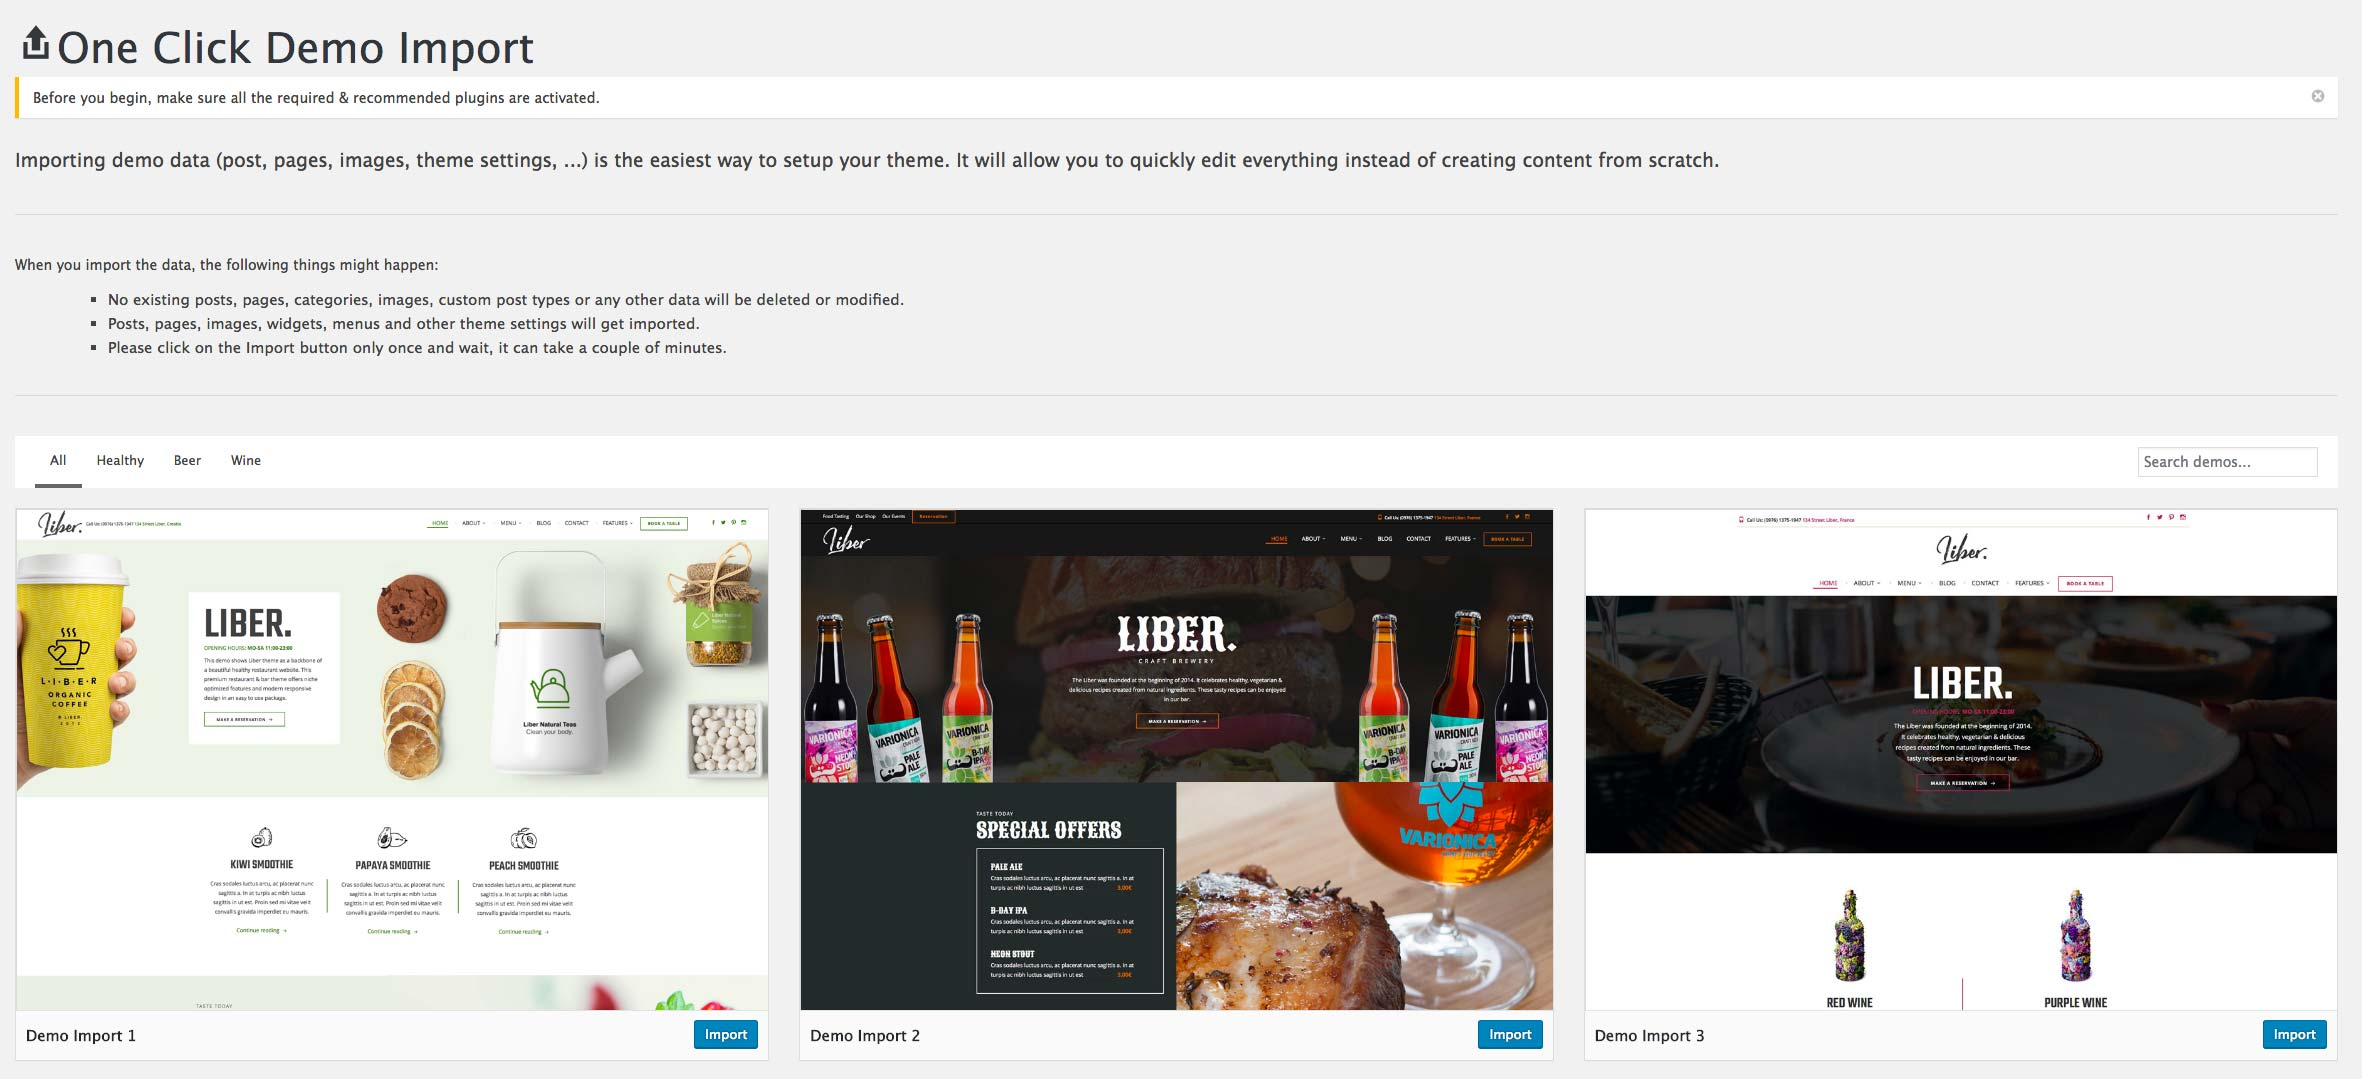 Liber - Premium WordPress Theme